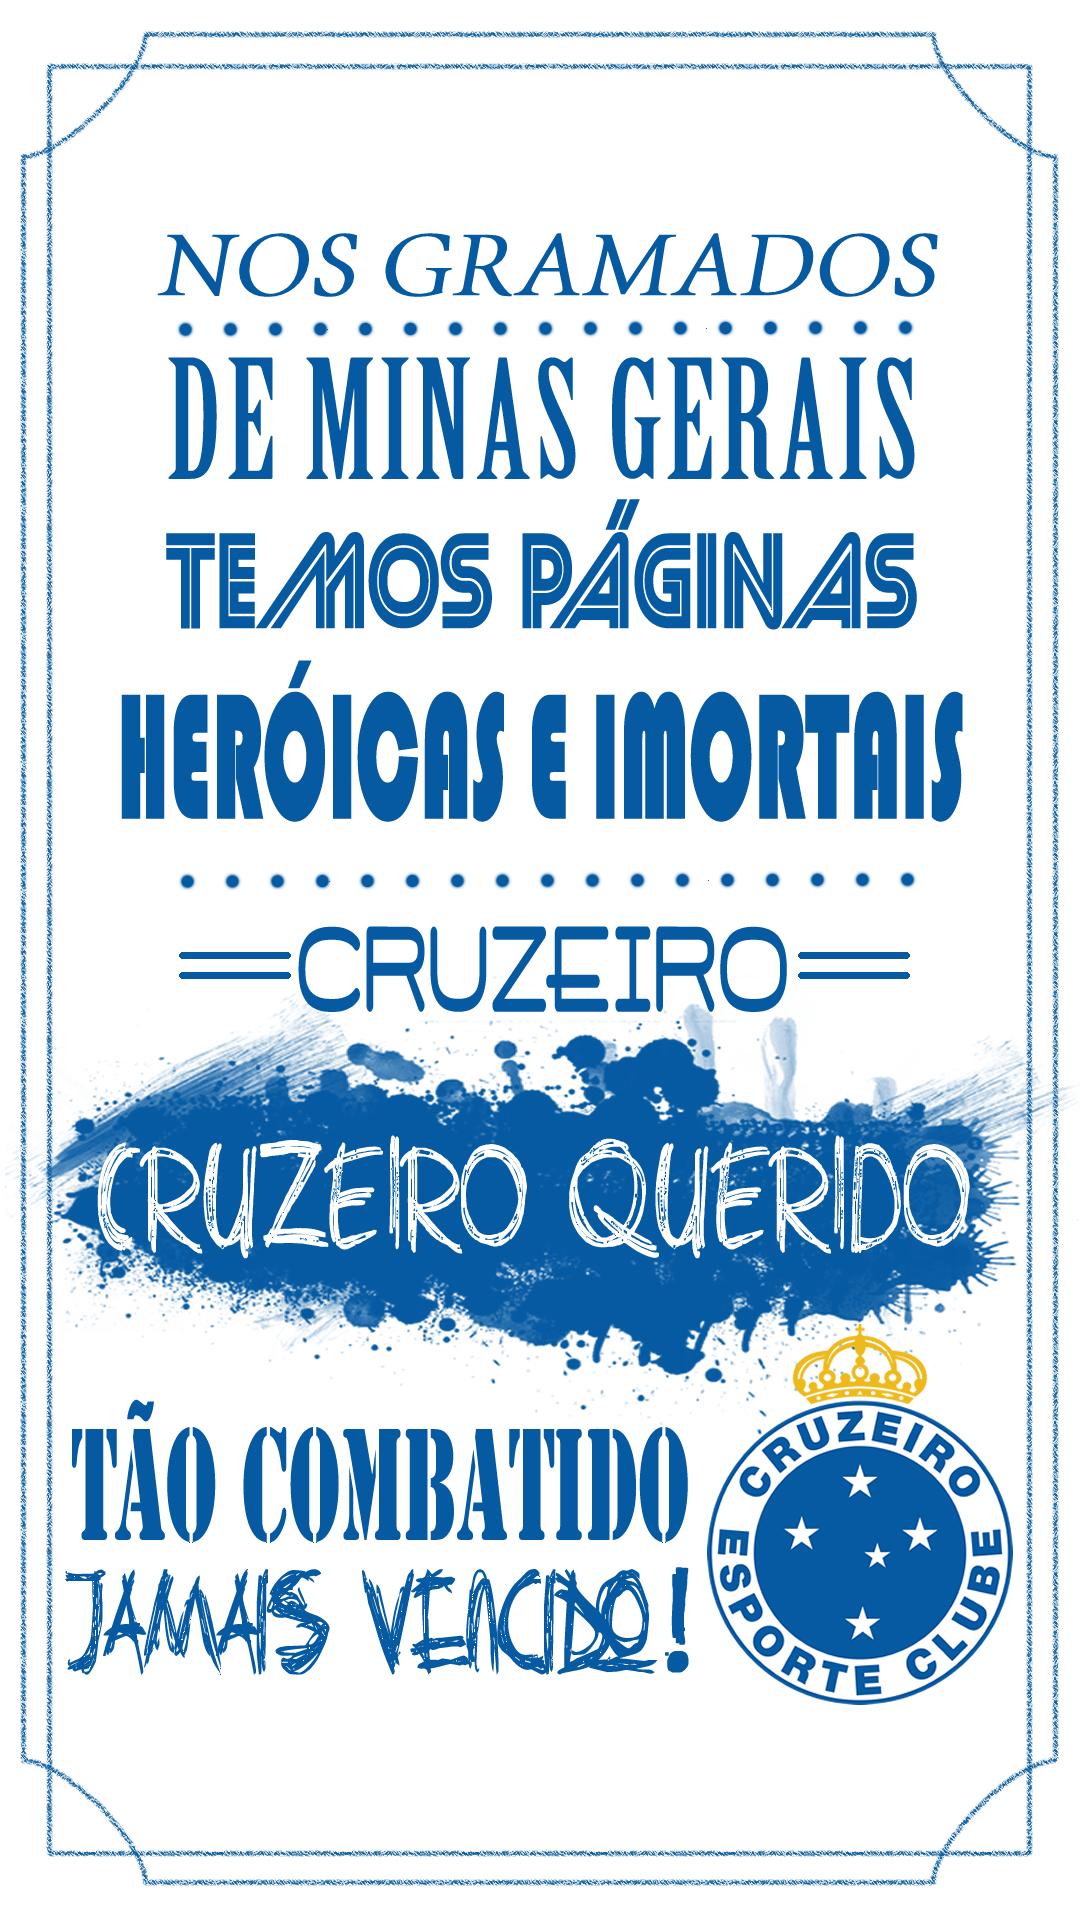 5ce1935399  OsDoBarroPreto  SomosAzuis  NascidosPalestra  ForjadosCruzeiro  Cruzeiro   PáginasHeróicasIMORTAIS  SomosCruzeiro  CruzeiroEsporteClube  MáfiaAzul   TFC ...